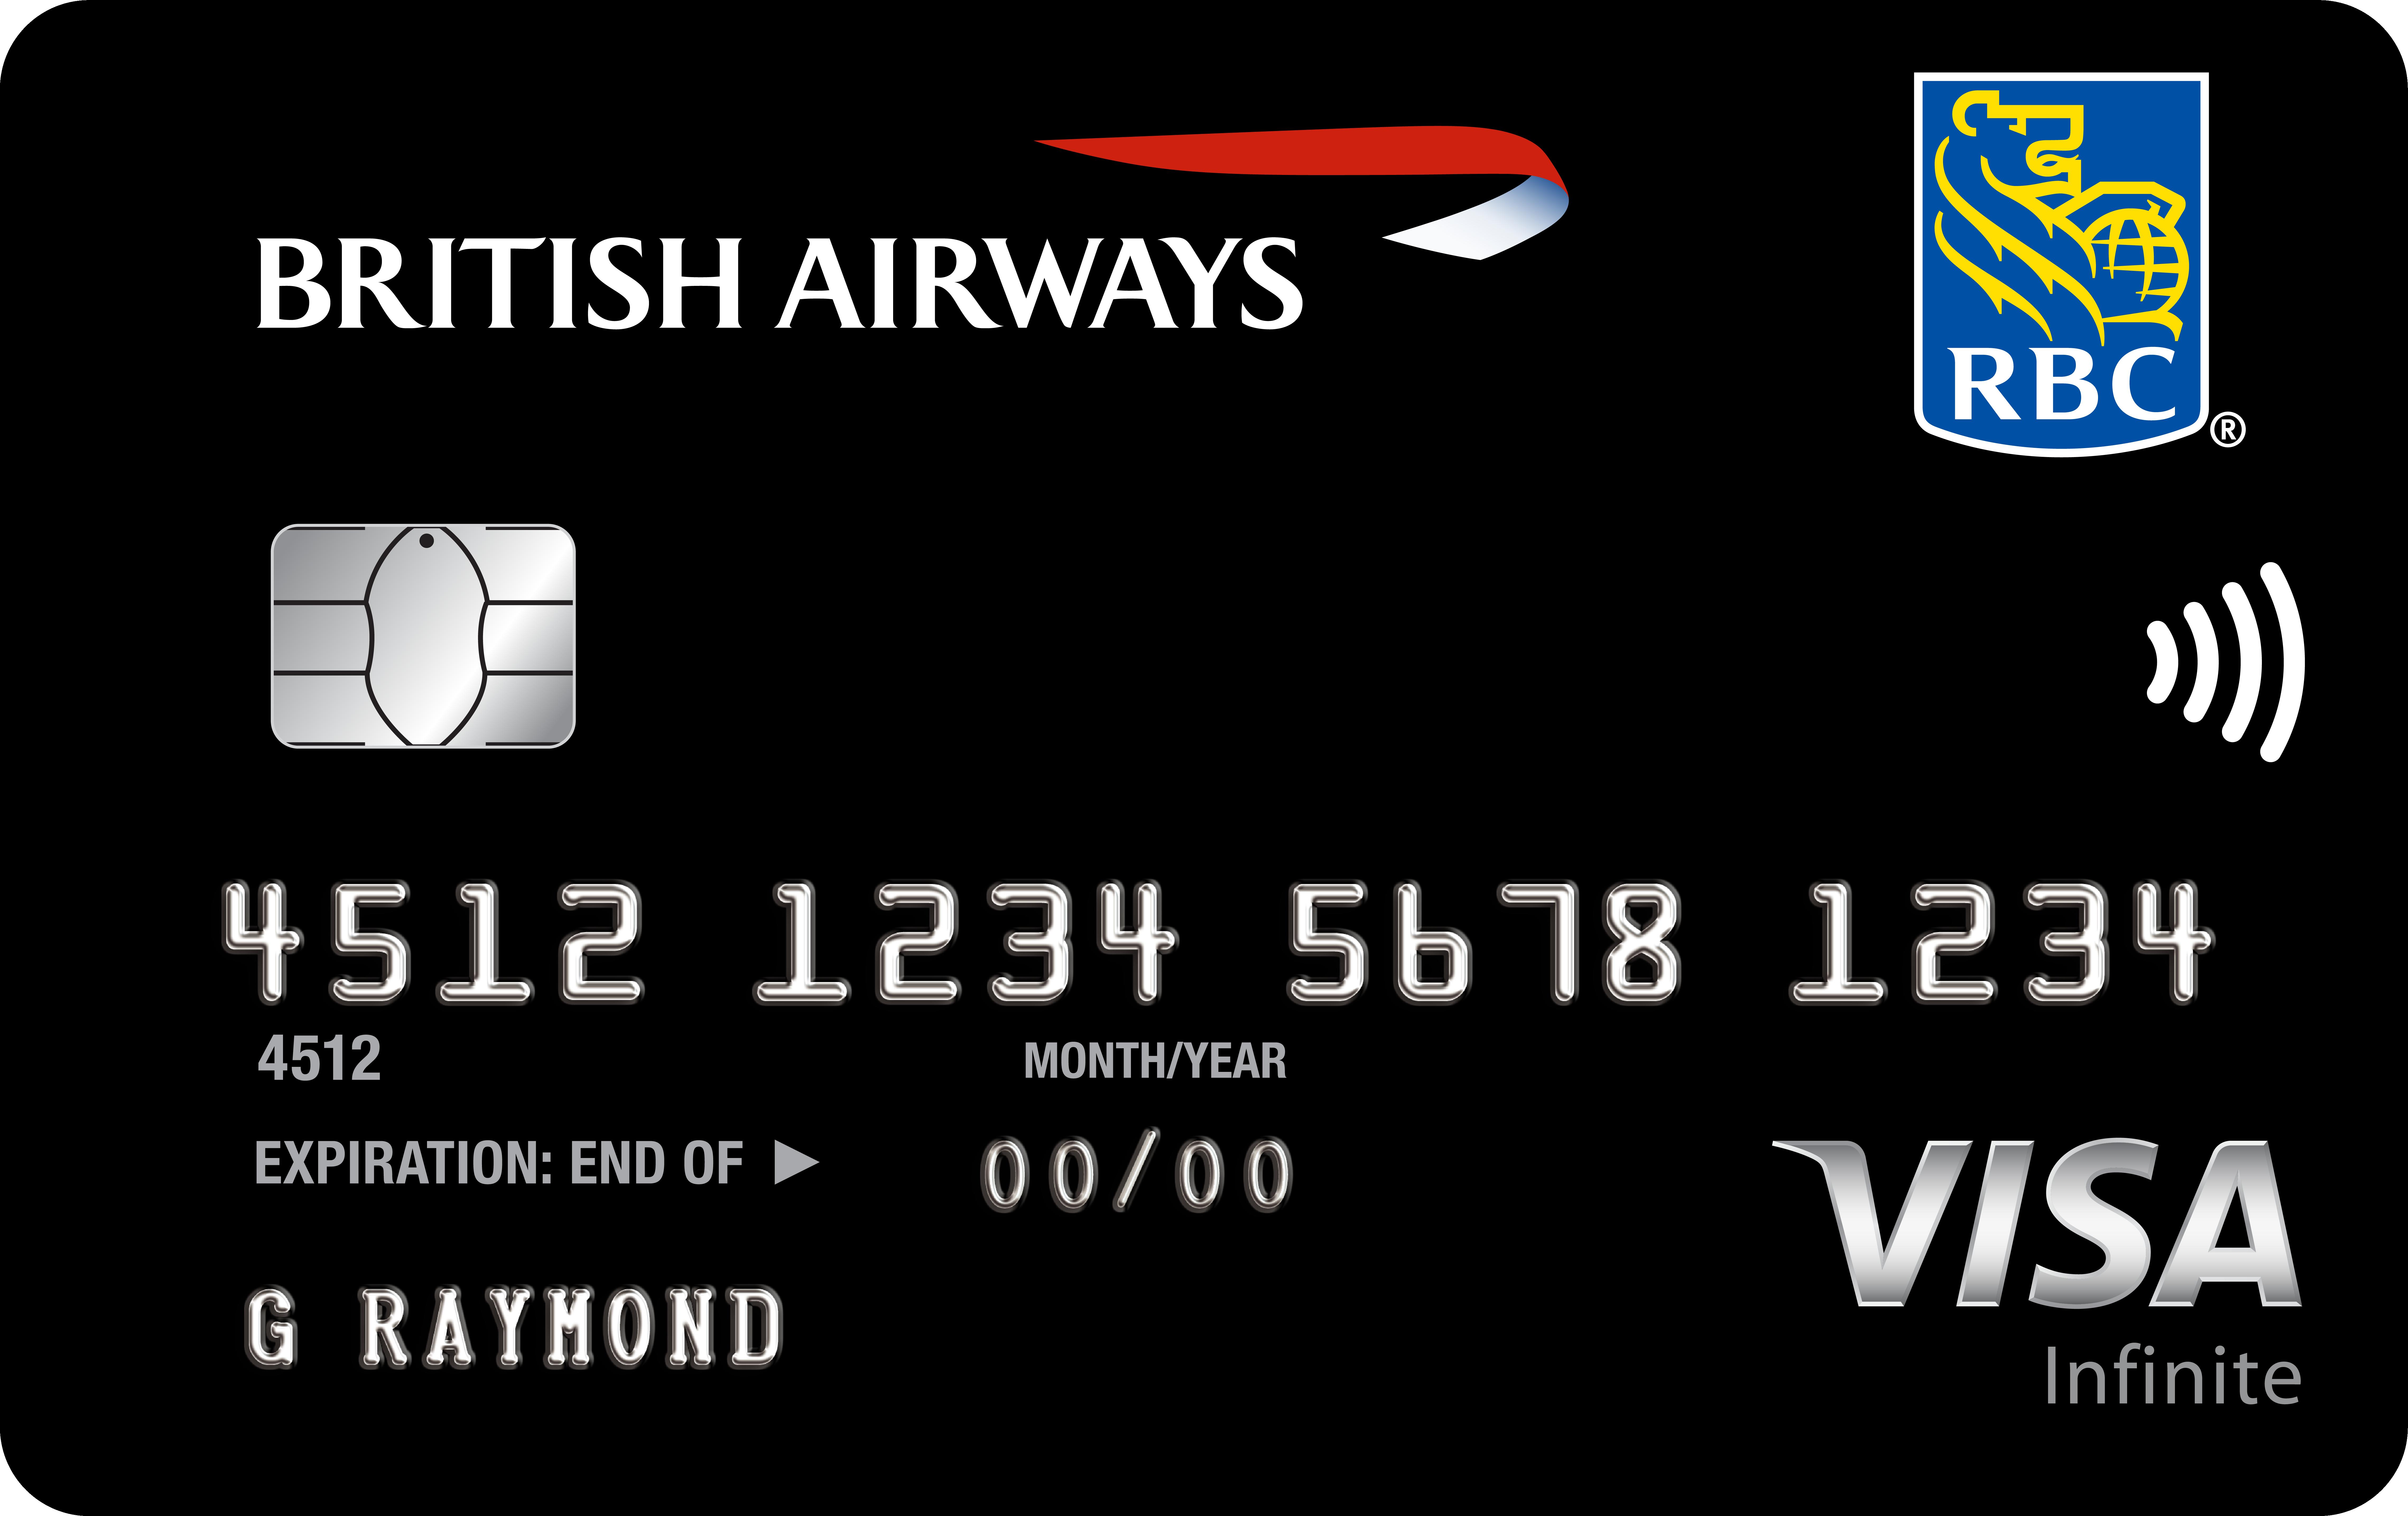 RBC British Airways Visa Infinite Card